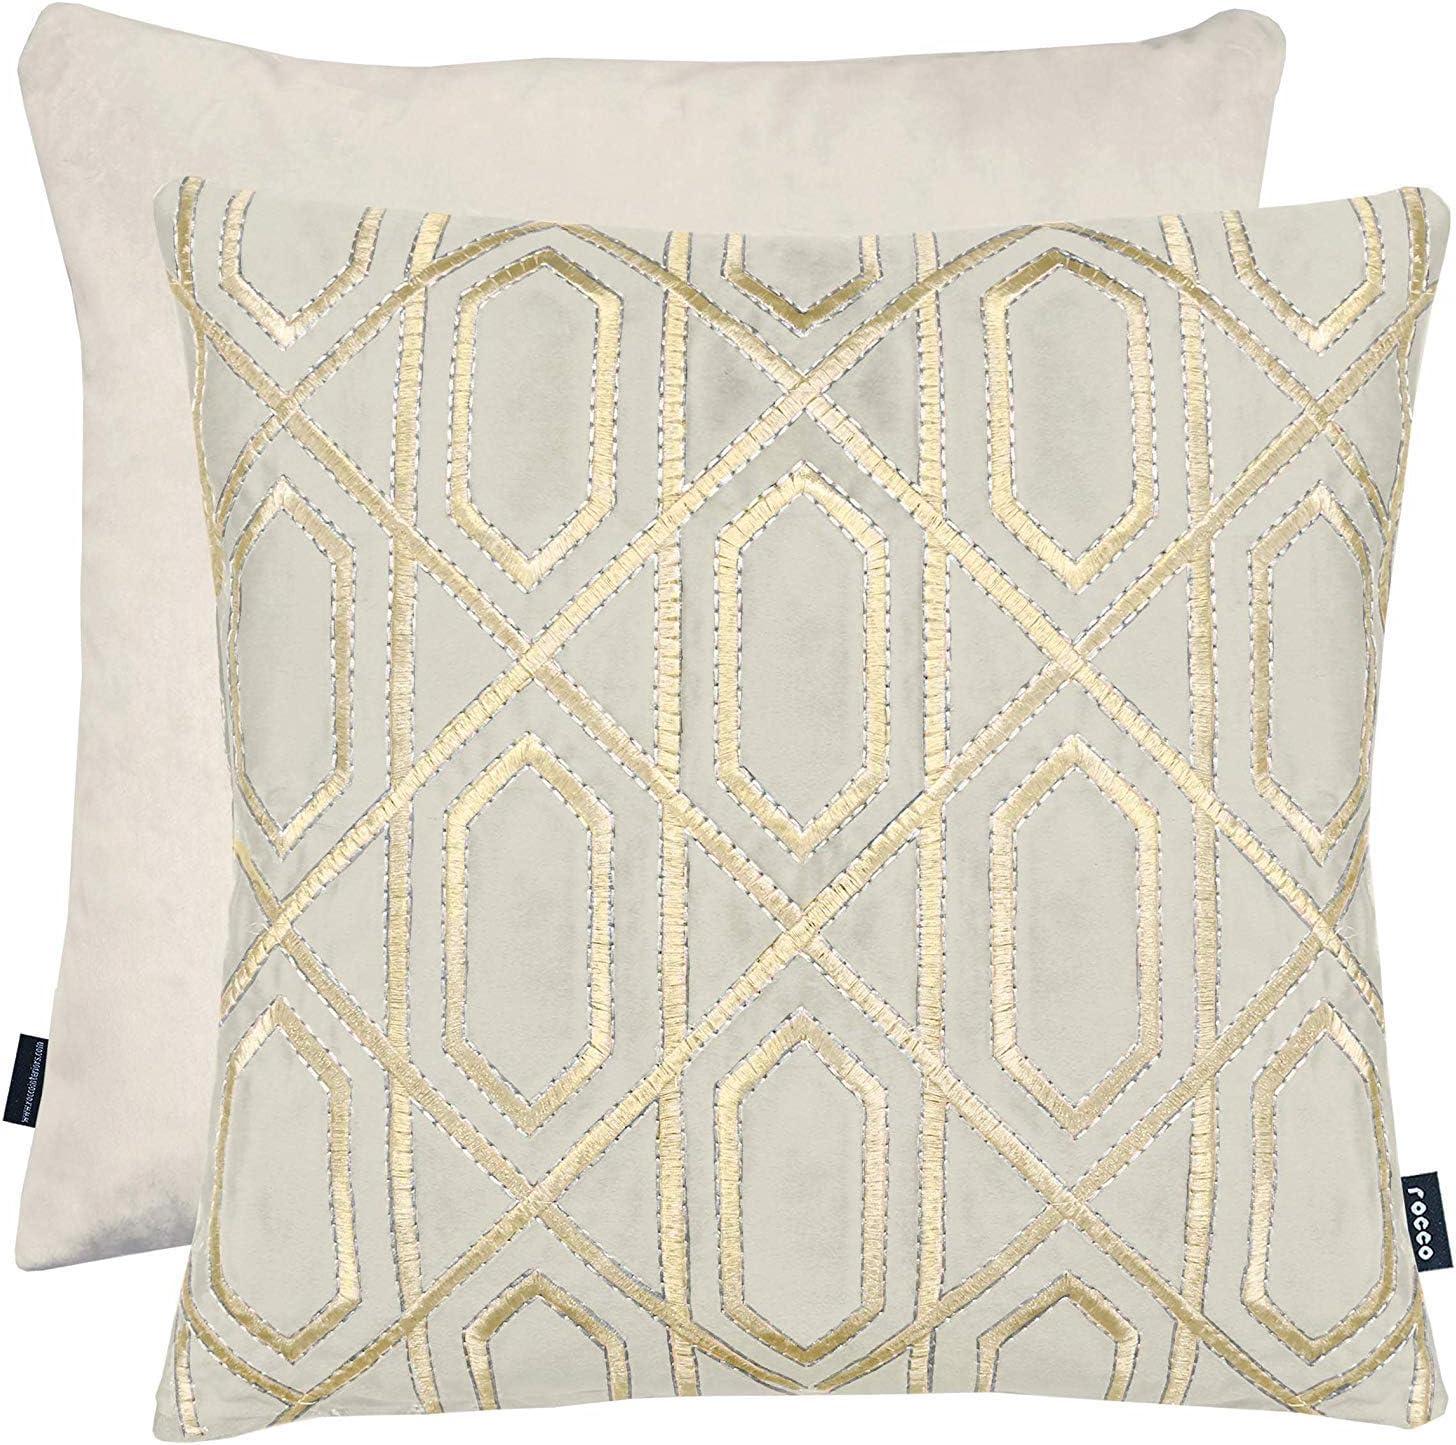 JeremyArtStore 18 x 18 Inches Decorative Cotton Linen Square Throw Pillow Case Cushion Cover Blue Orange Hummingbird Bird Teal Aqua Red Flowers Design